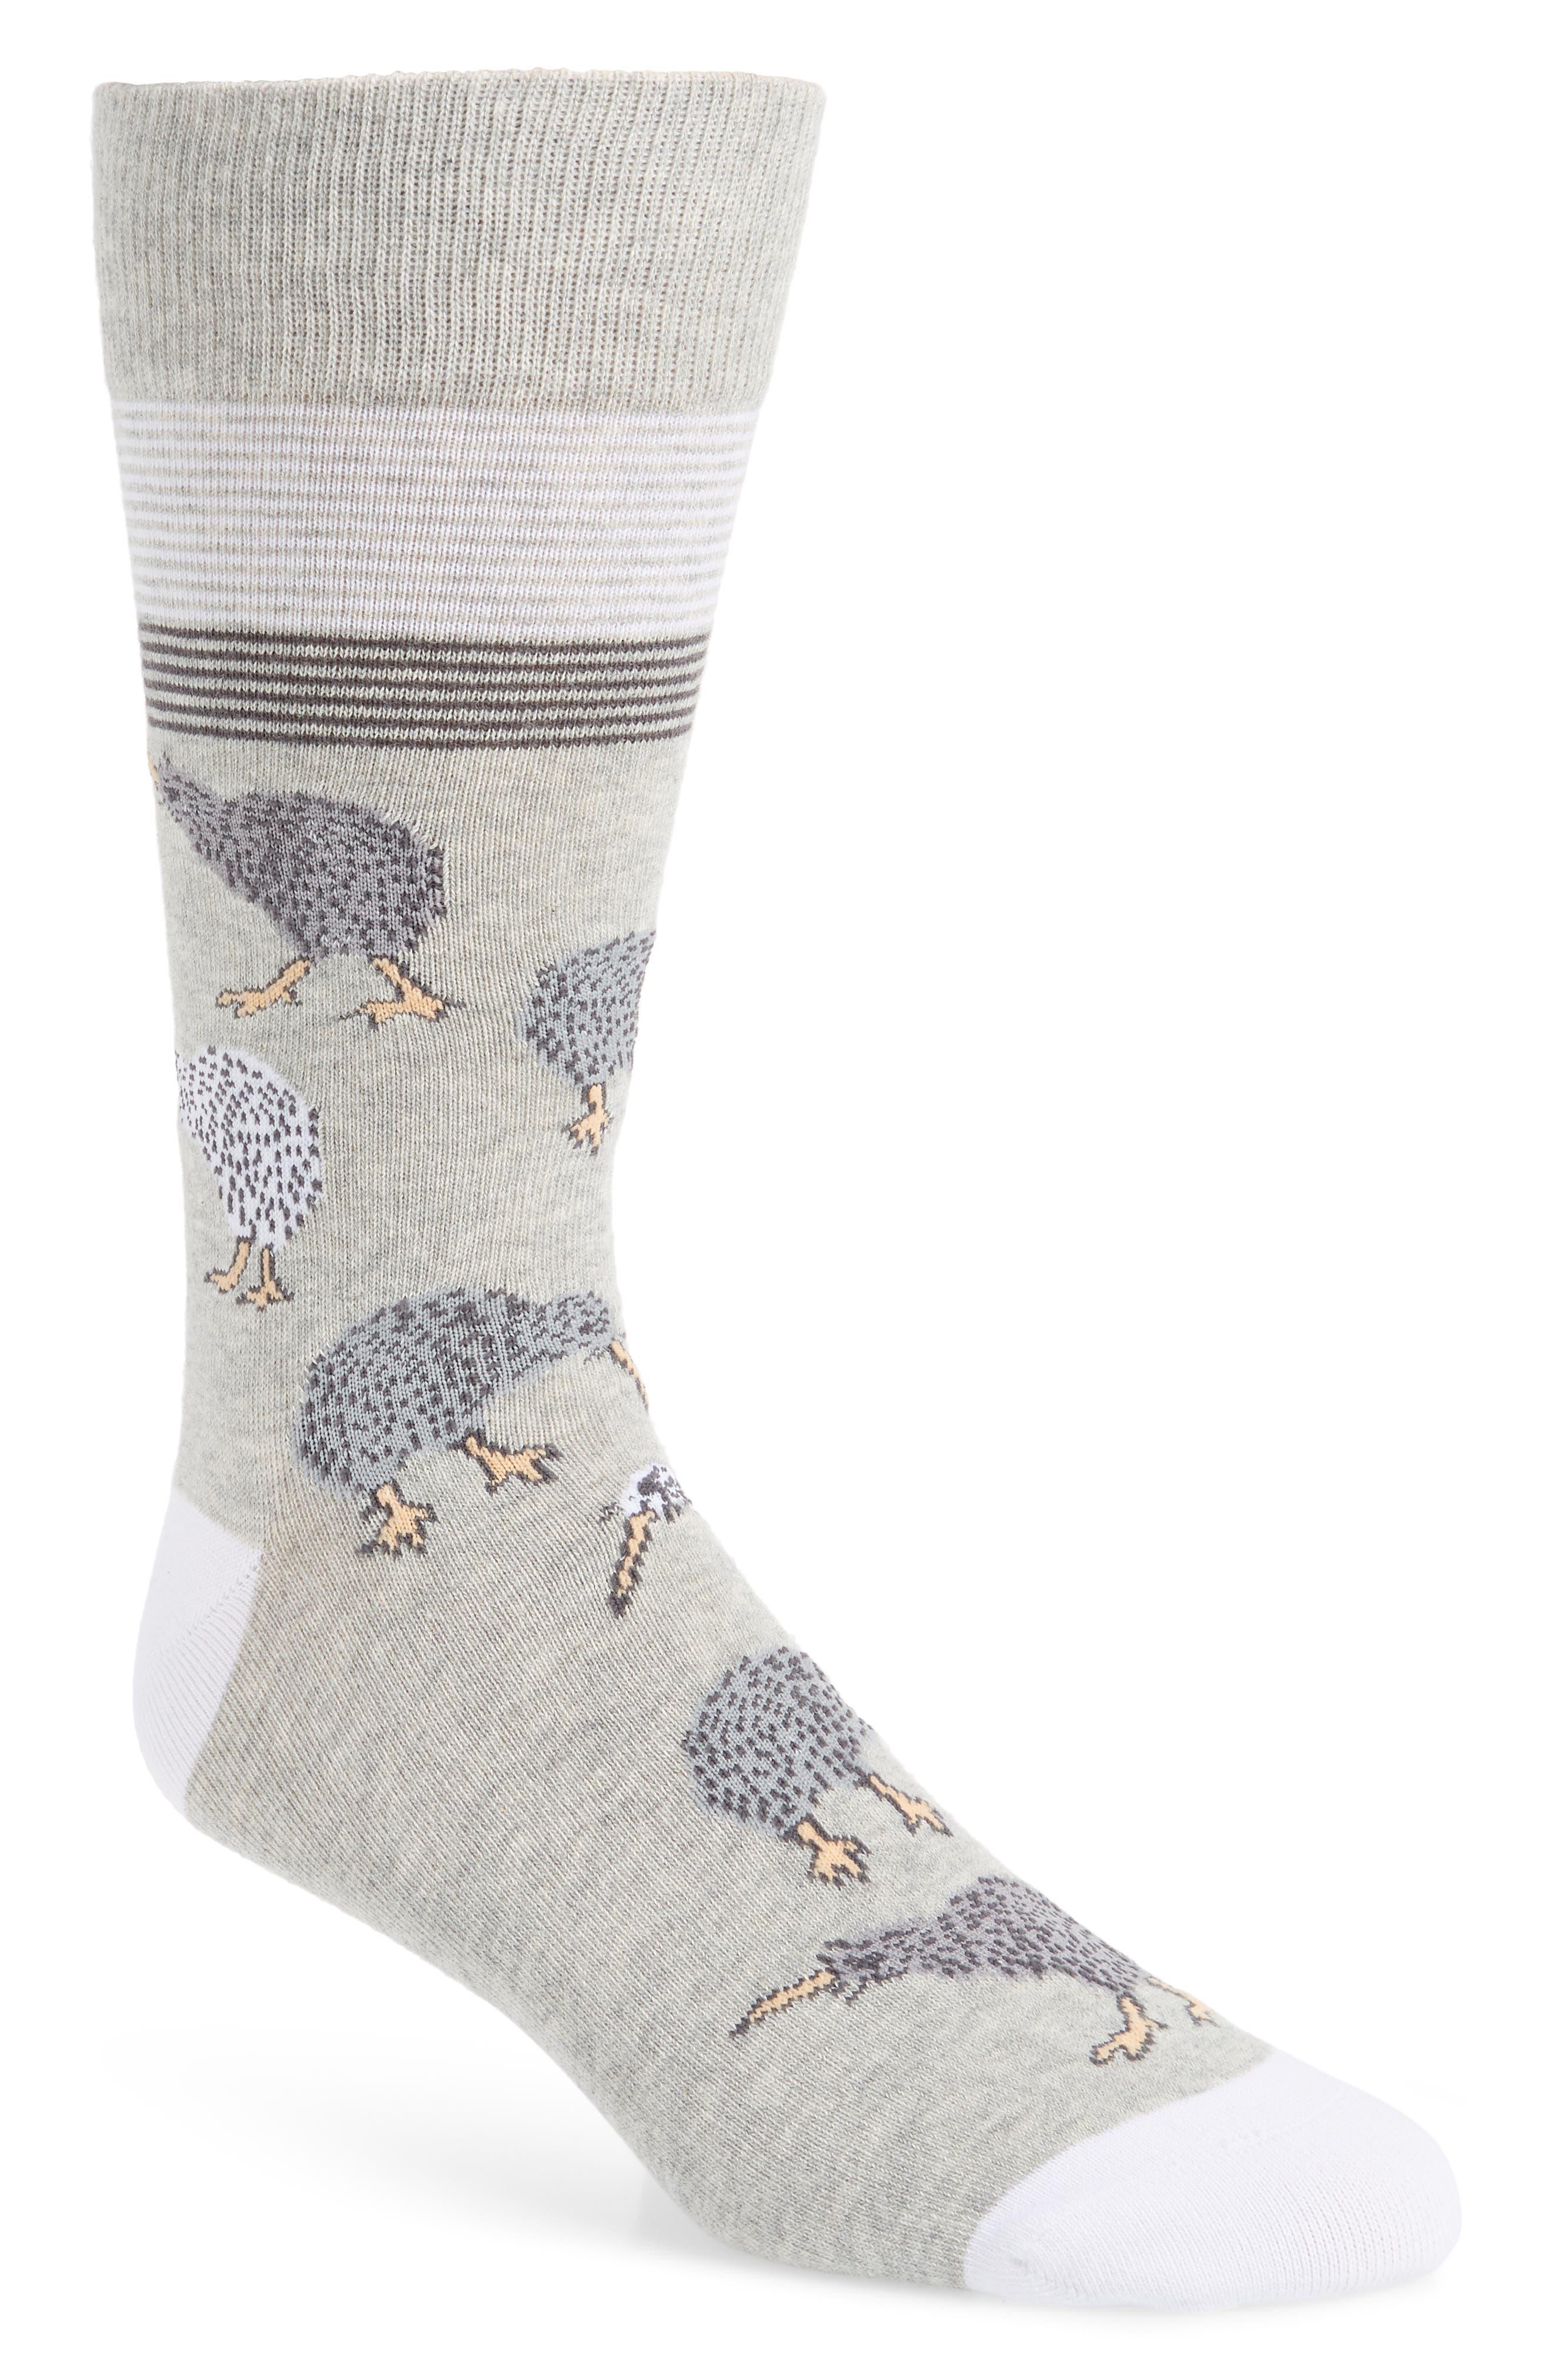 CALIBRATE Kiwi Birds Socks, Main, color, GREY/ CHARCOAL